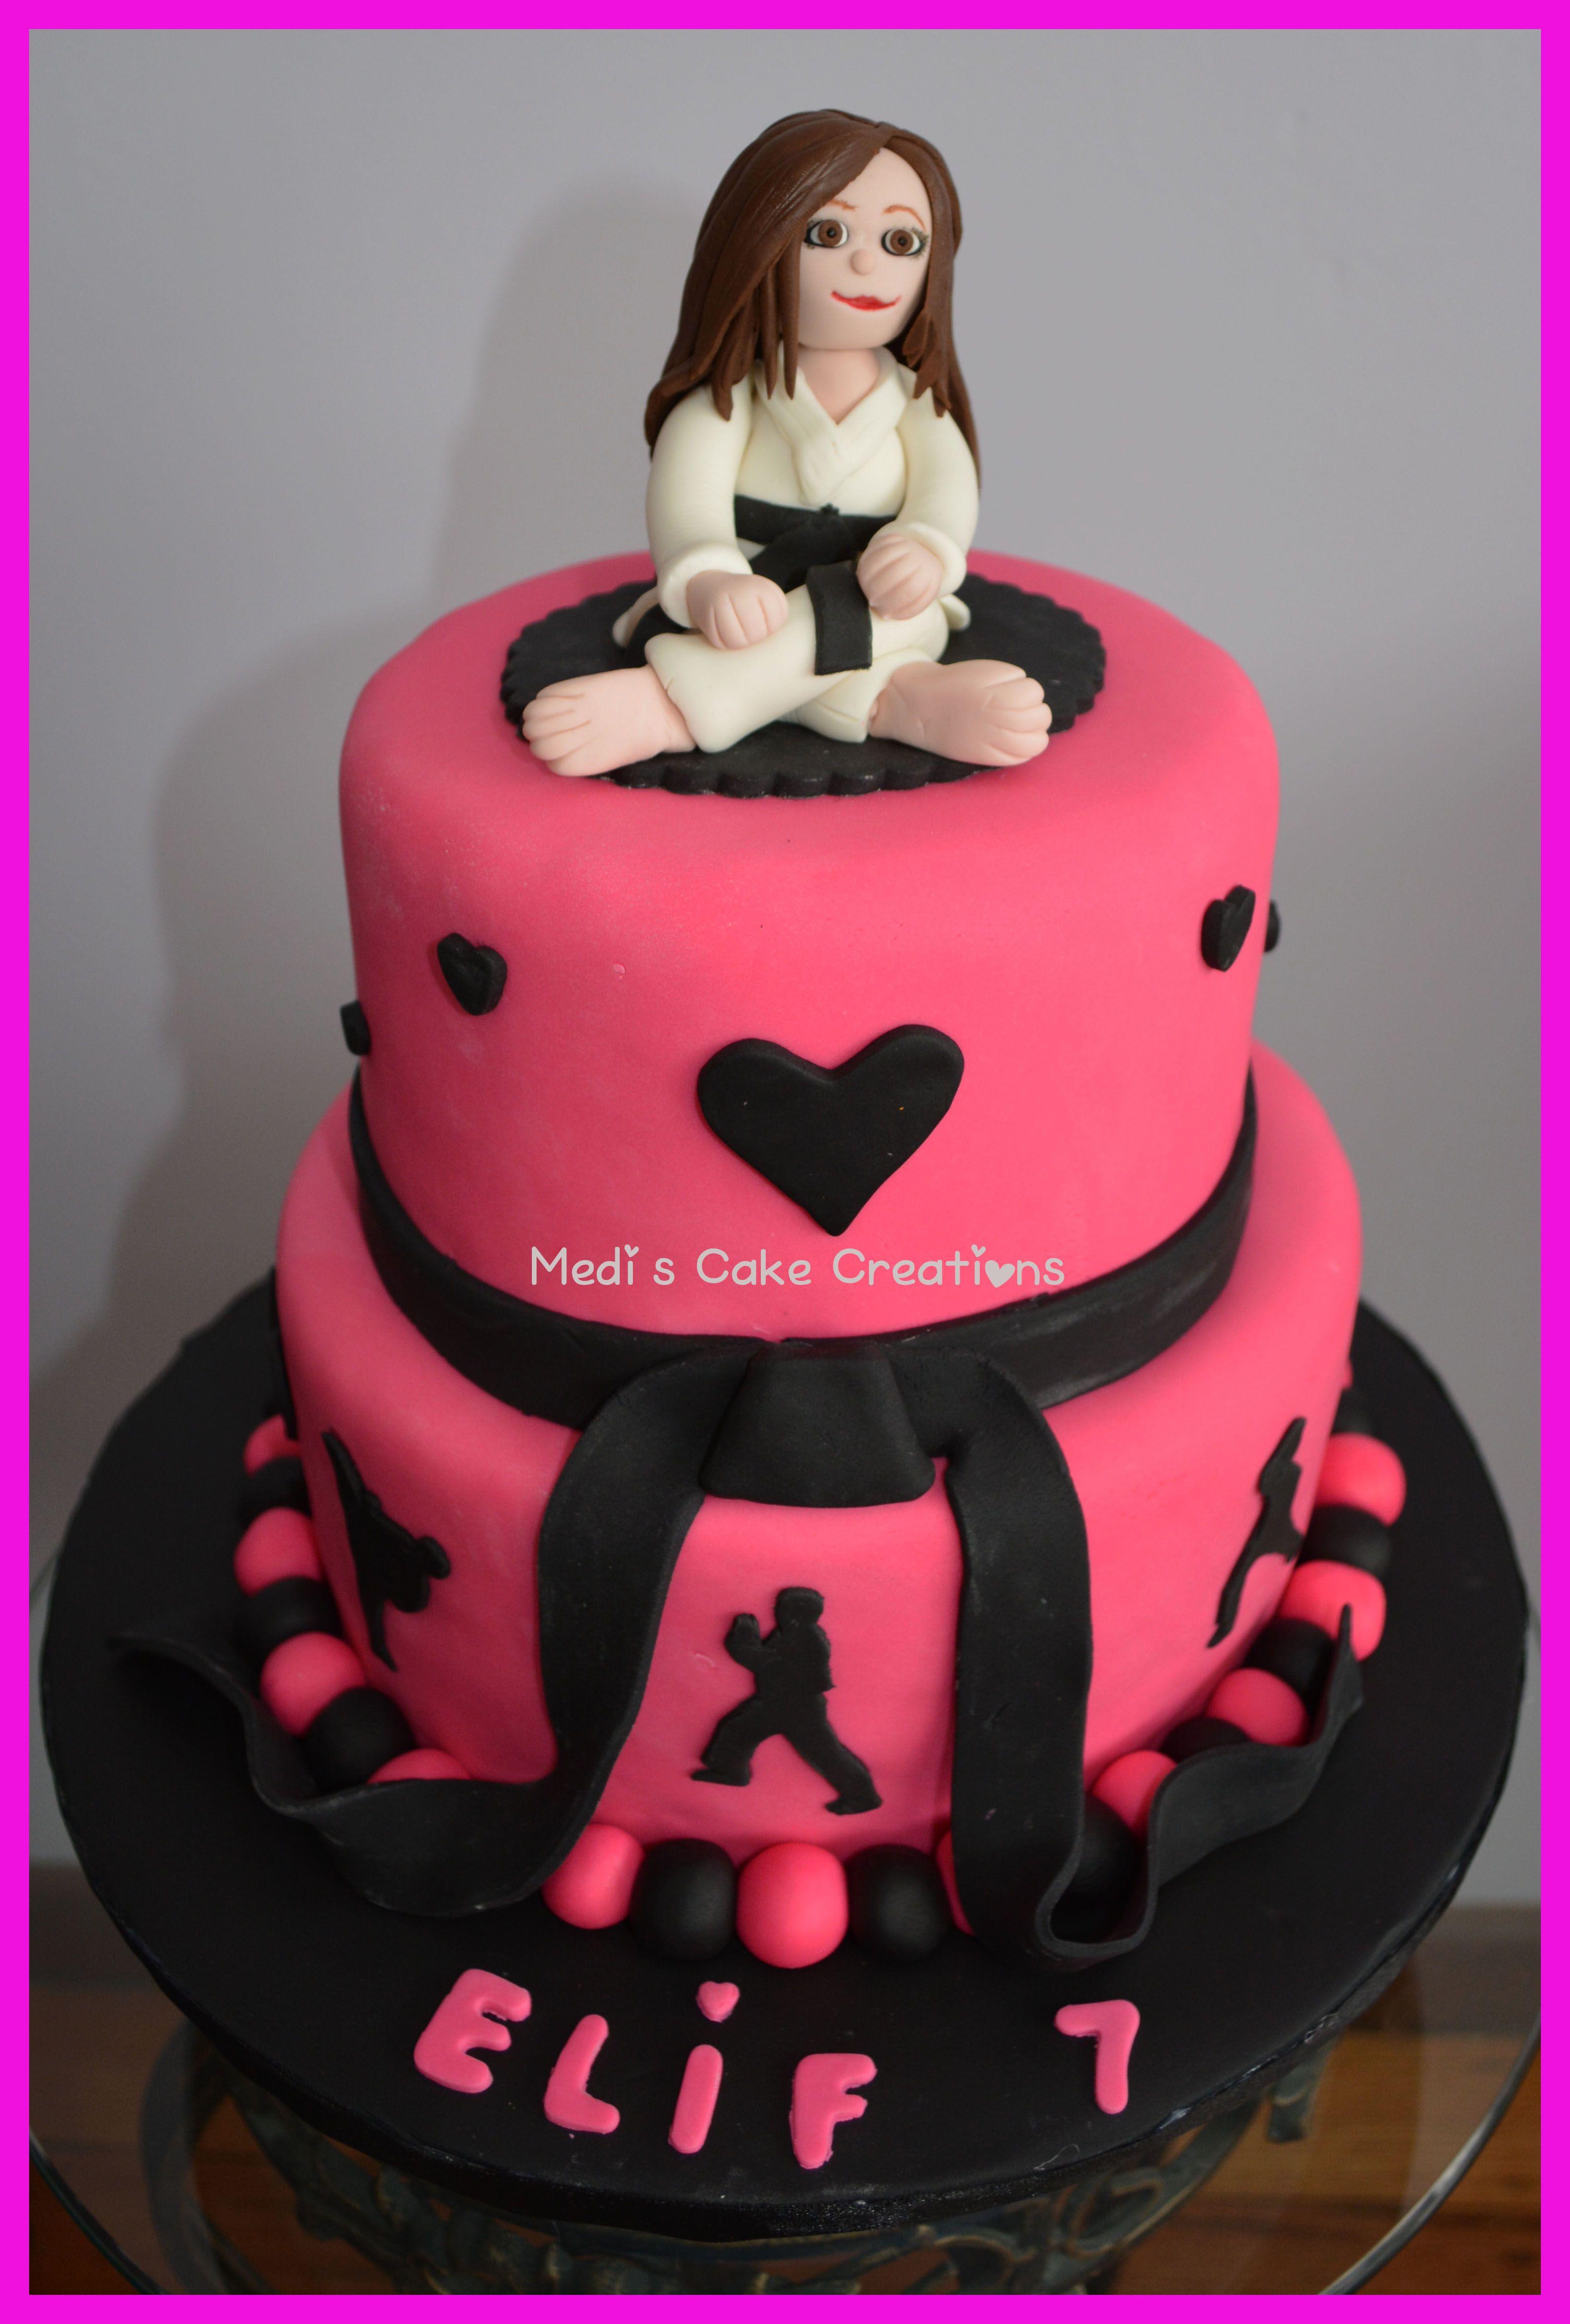 My Taekwondo Cake Creation With An Edible Black Belt Girl